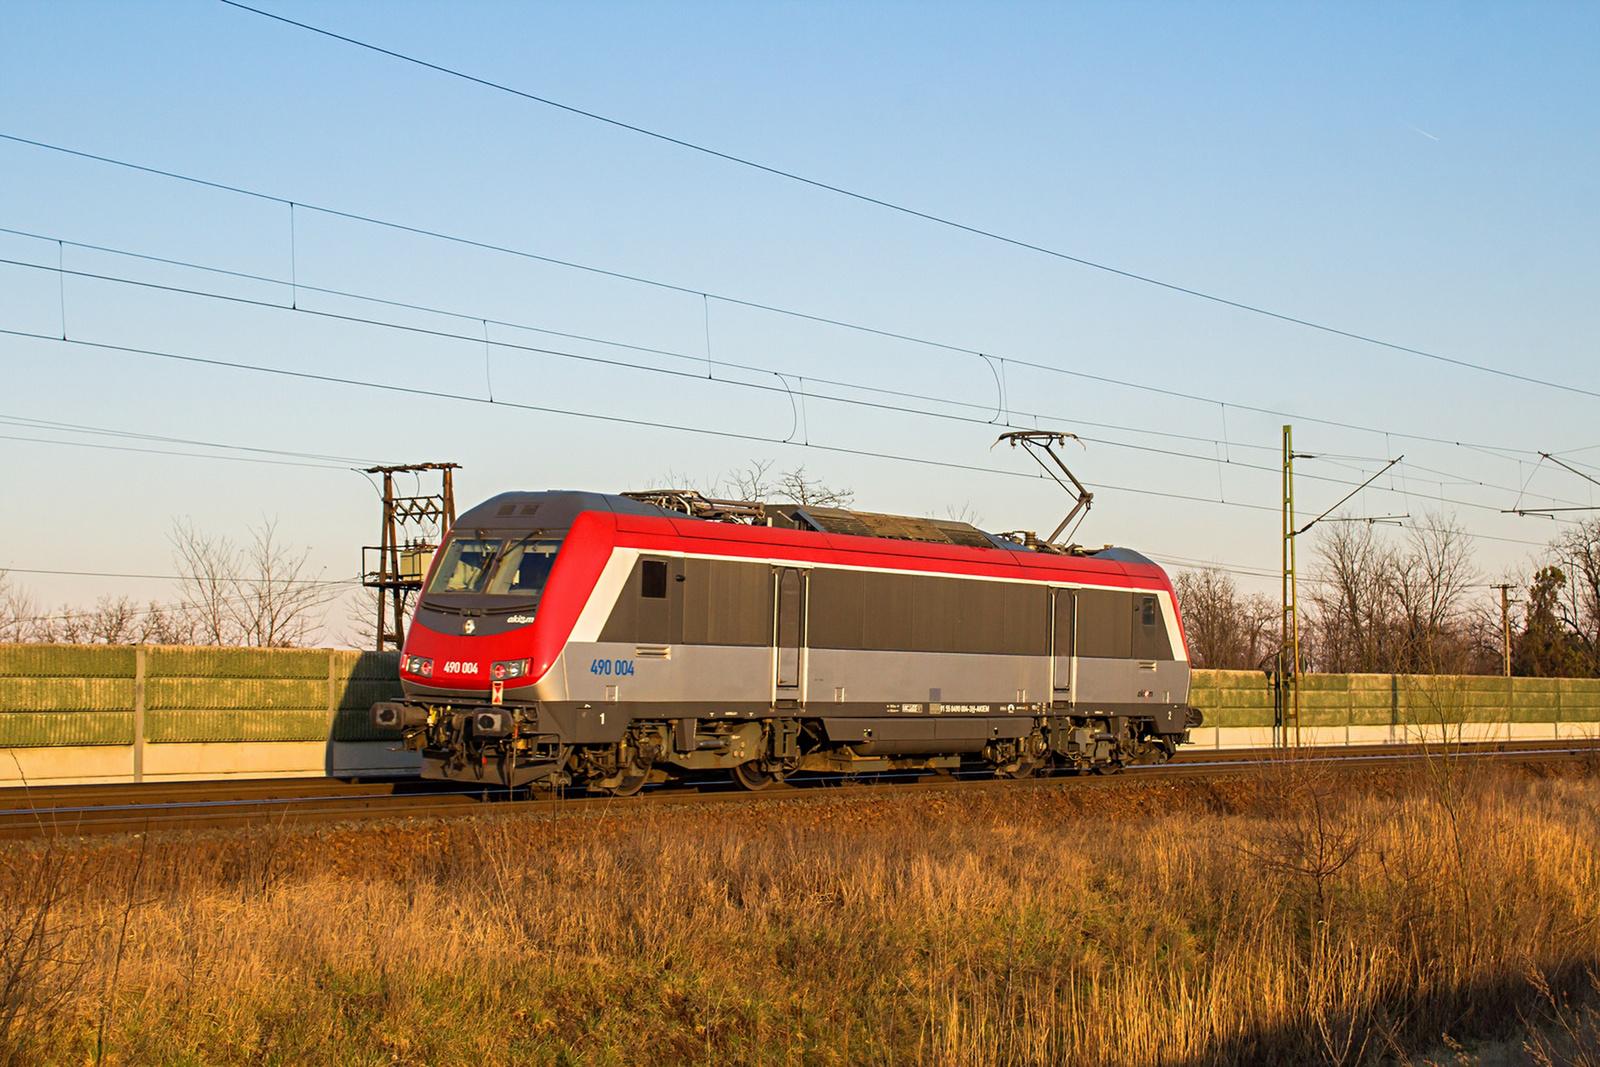 490 004 Albertirsa (2021.03.07).02